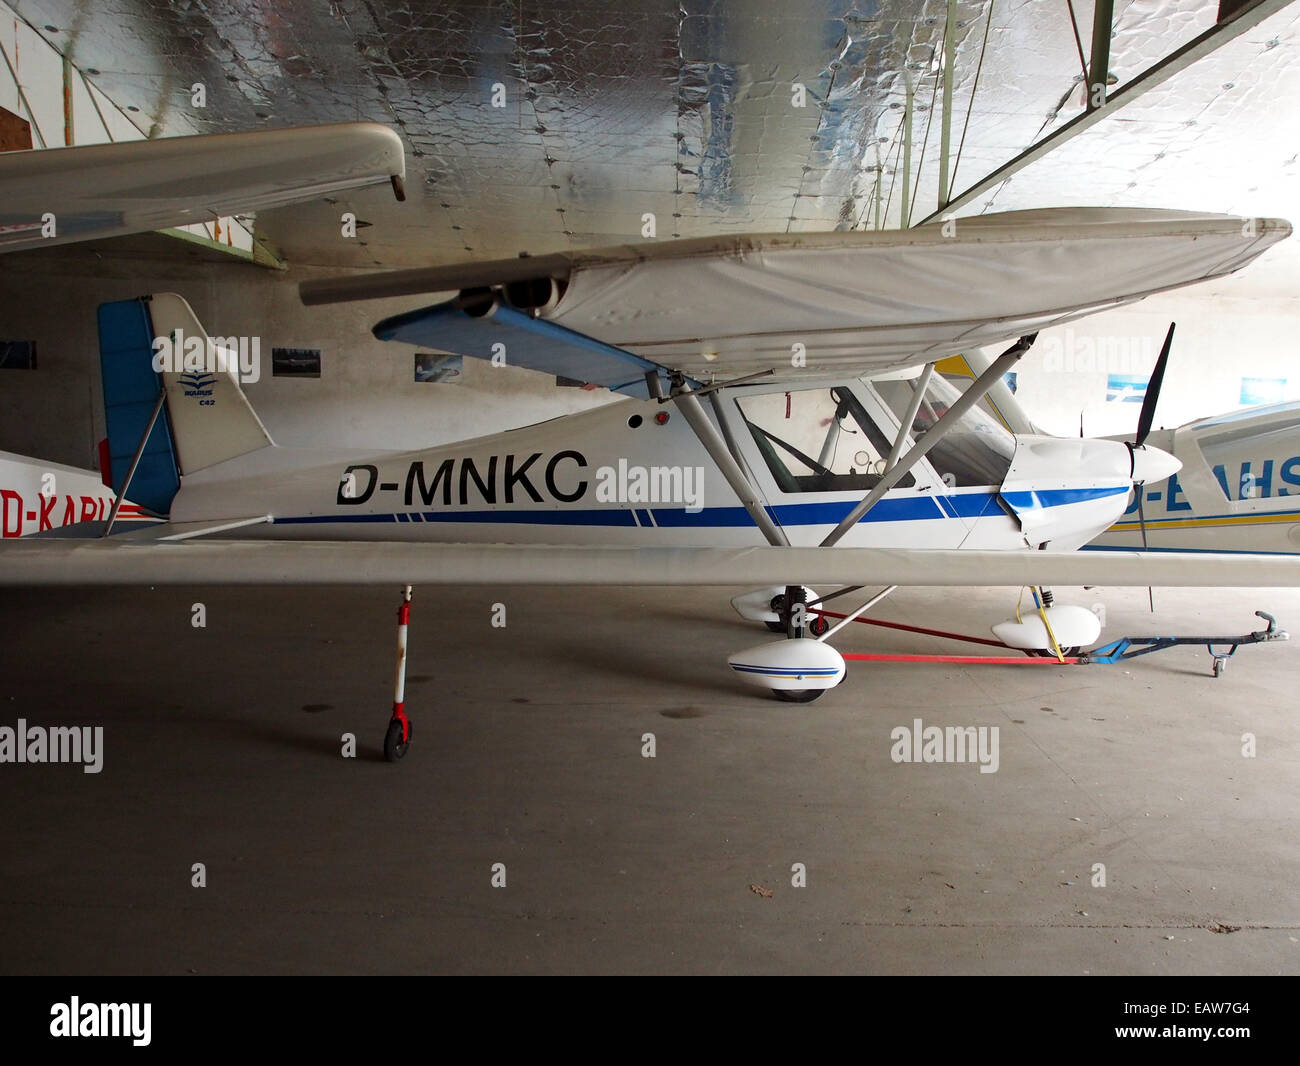 D Mnkc Ultraleichtflugzeug Weko Ikarus C42 Pic4 Stockfoto Bild